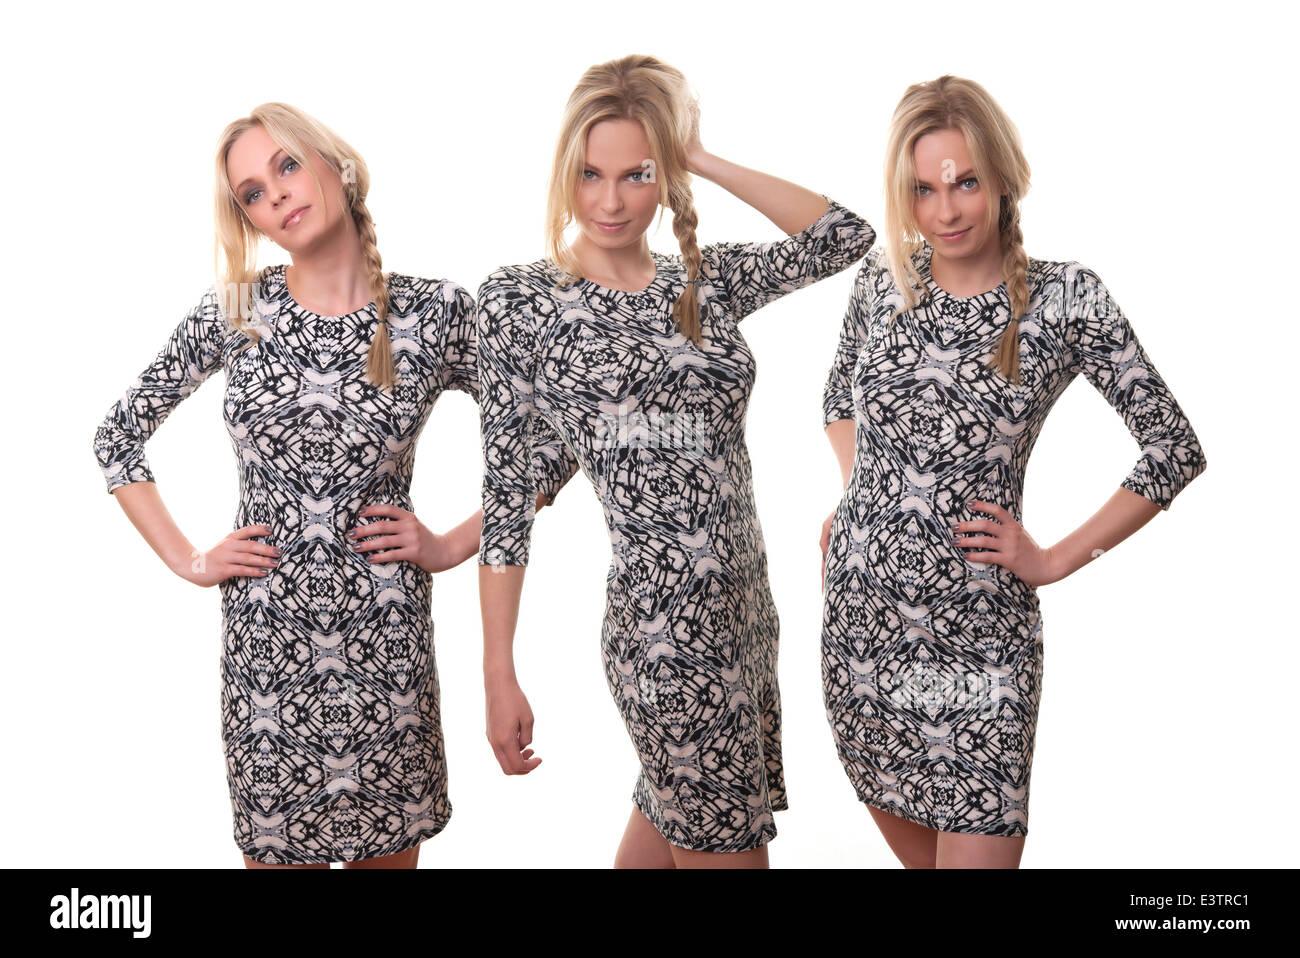 blonde group of girls wearing patterned dress - Stock Image